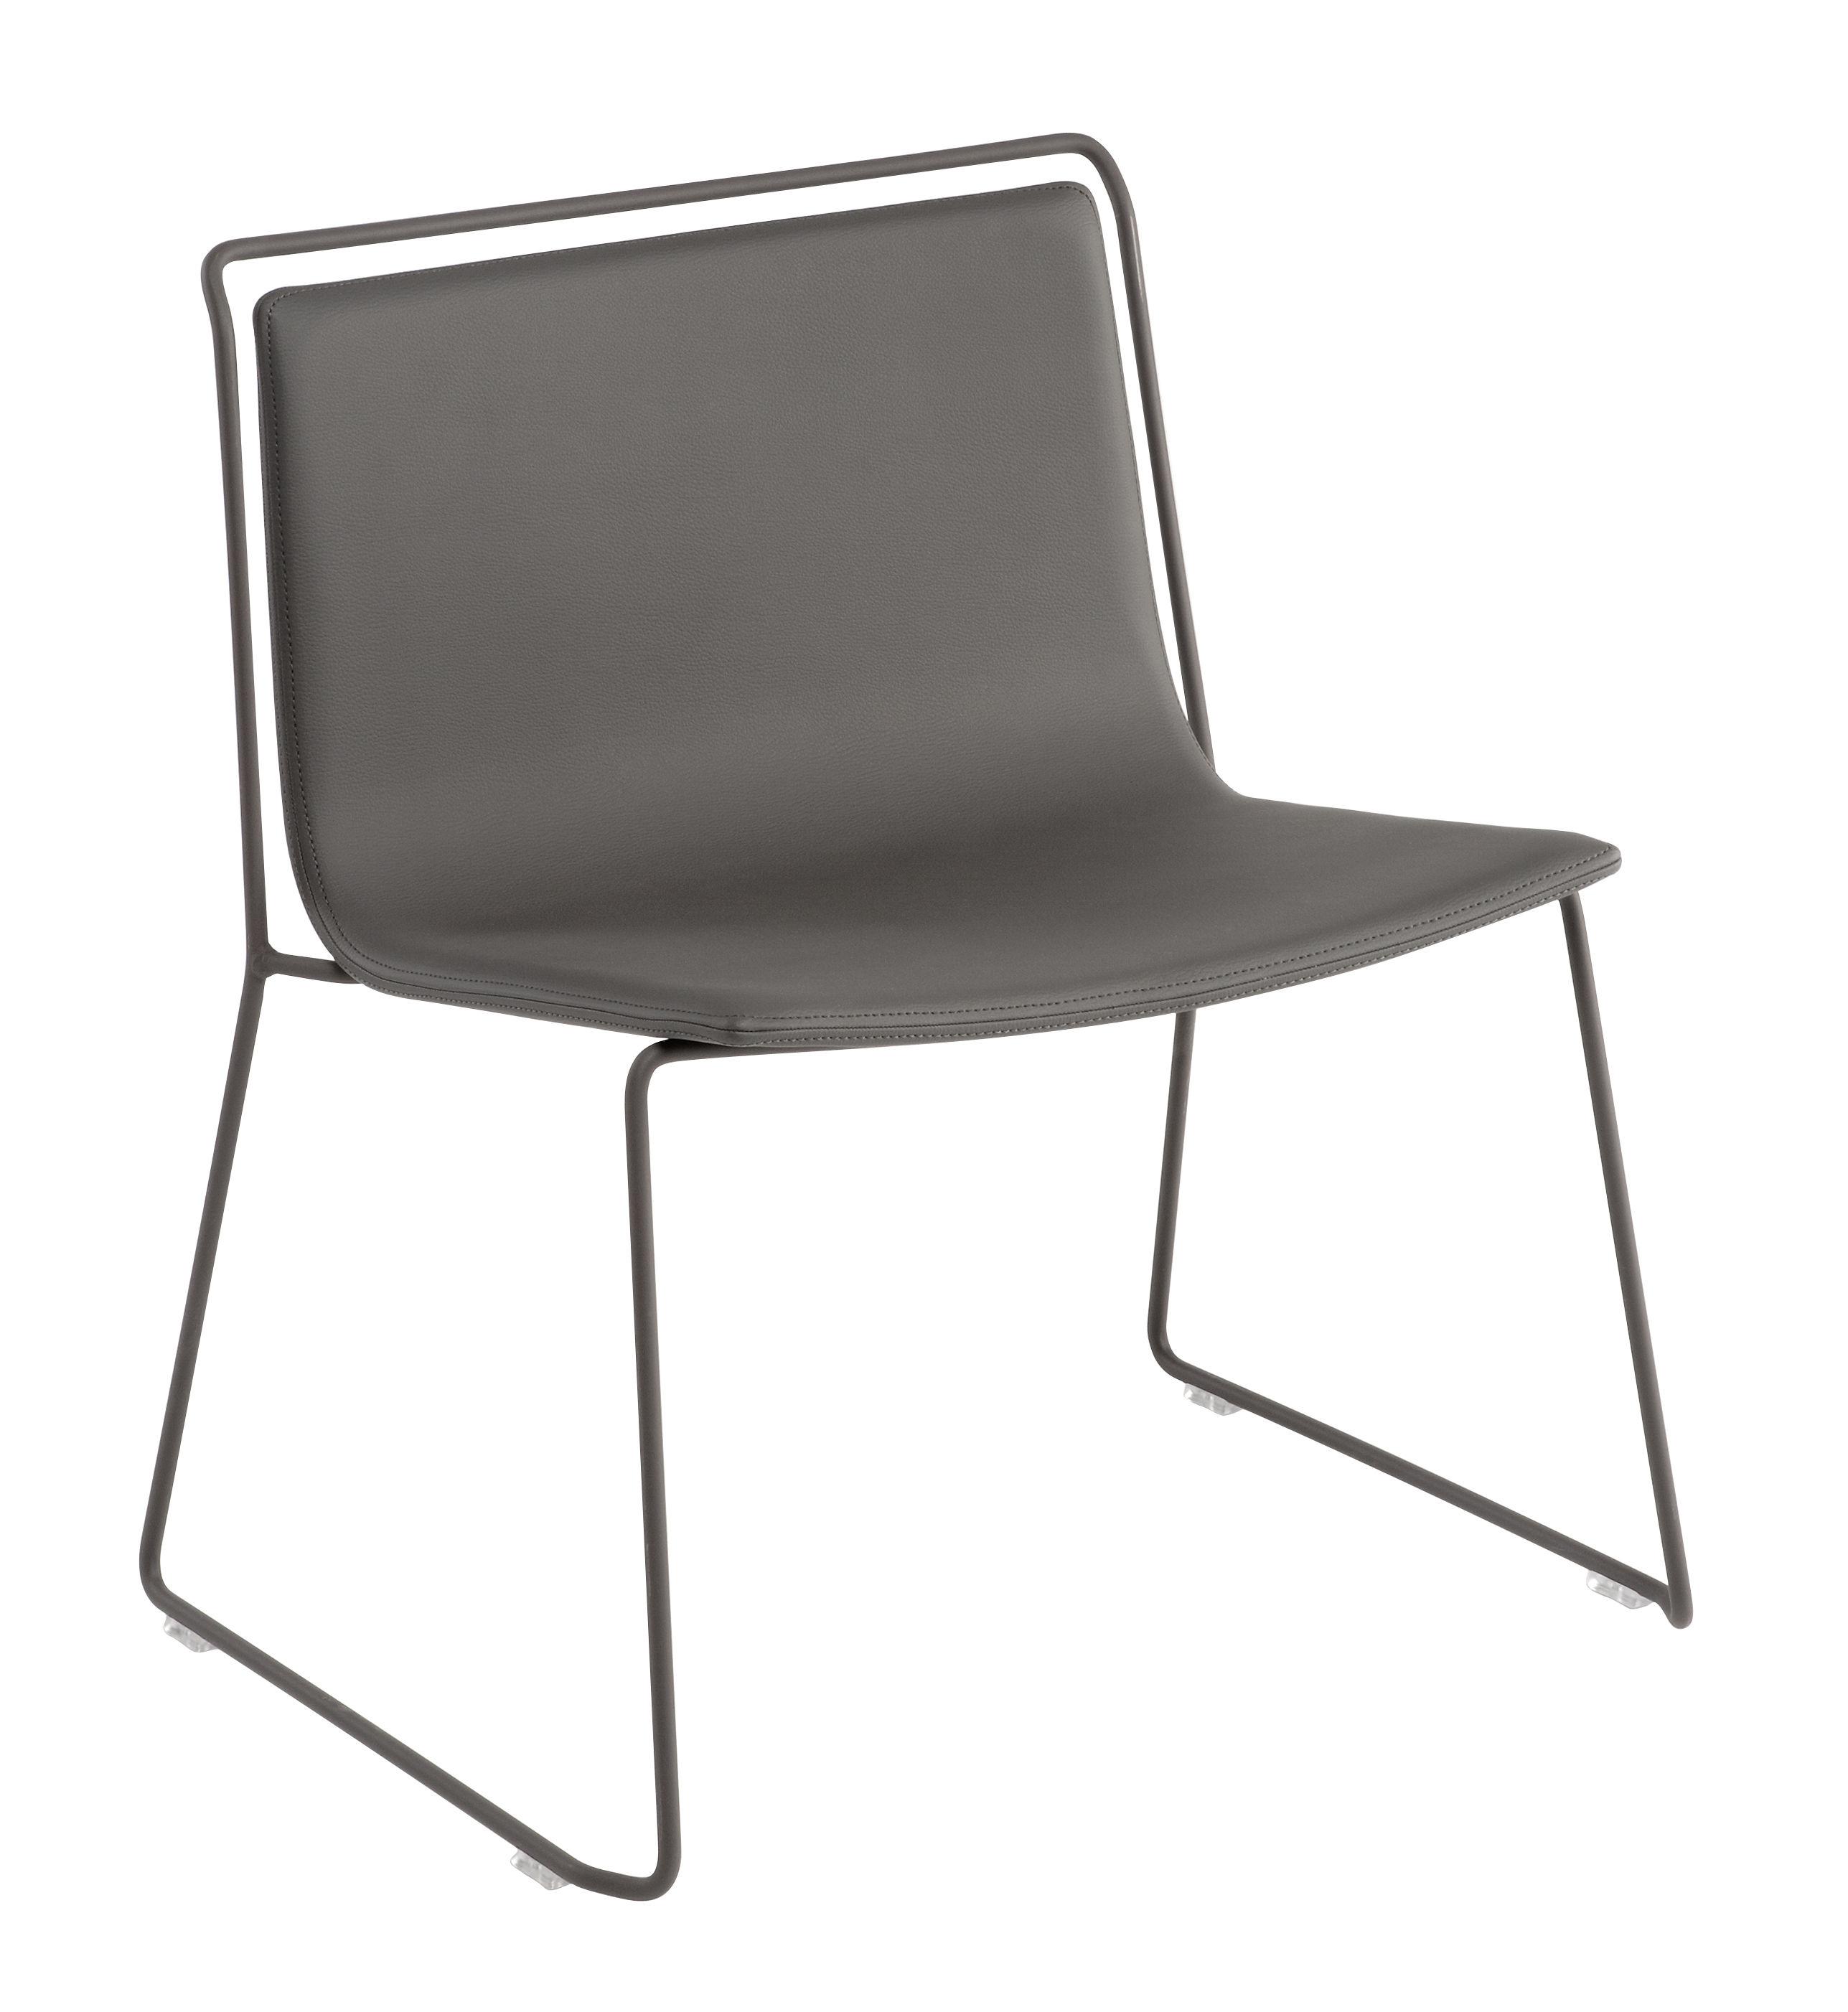 fauteuil bas alo xl similicuir anthracite structure grise ondarreta. Black Bedroom Furniture Sets. Home Design Ideas